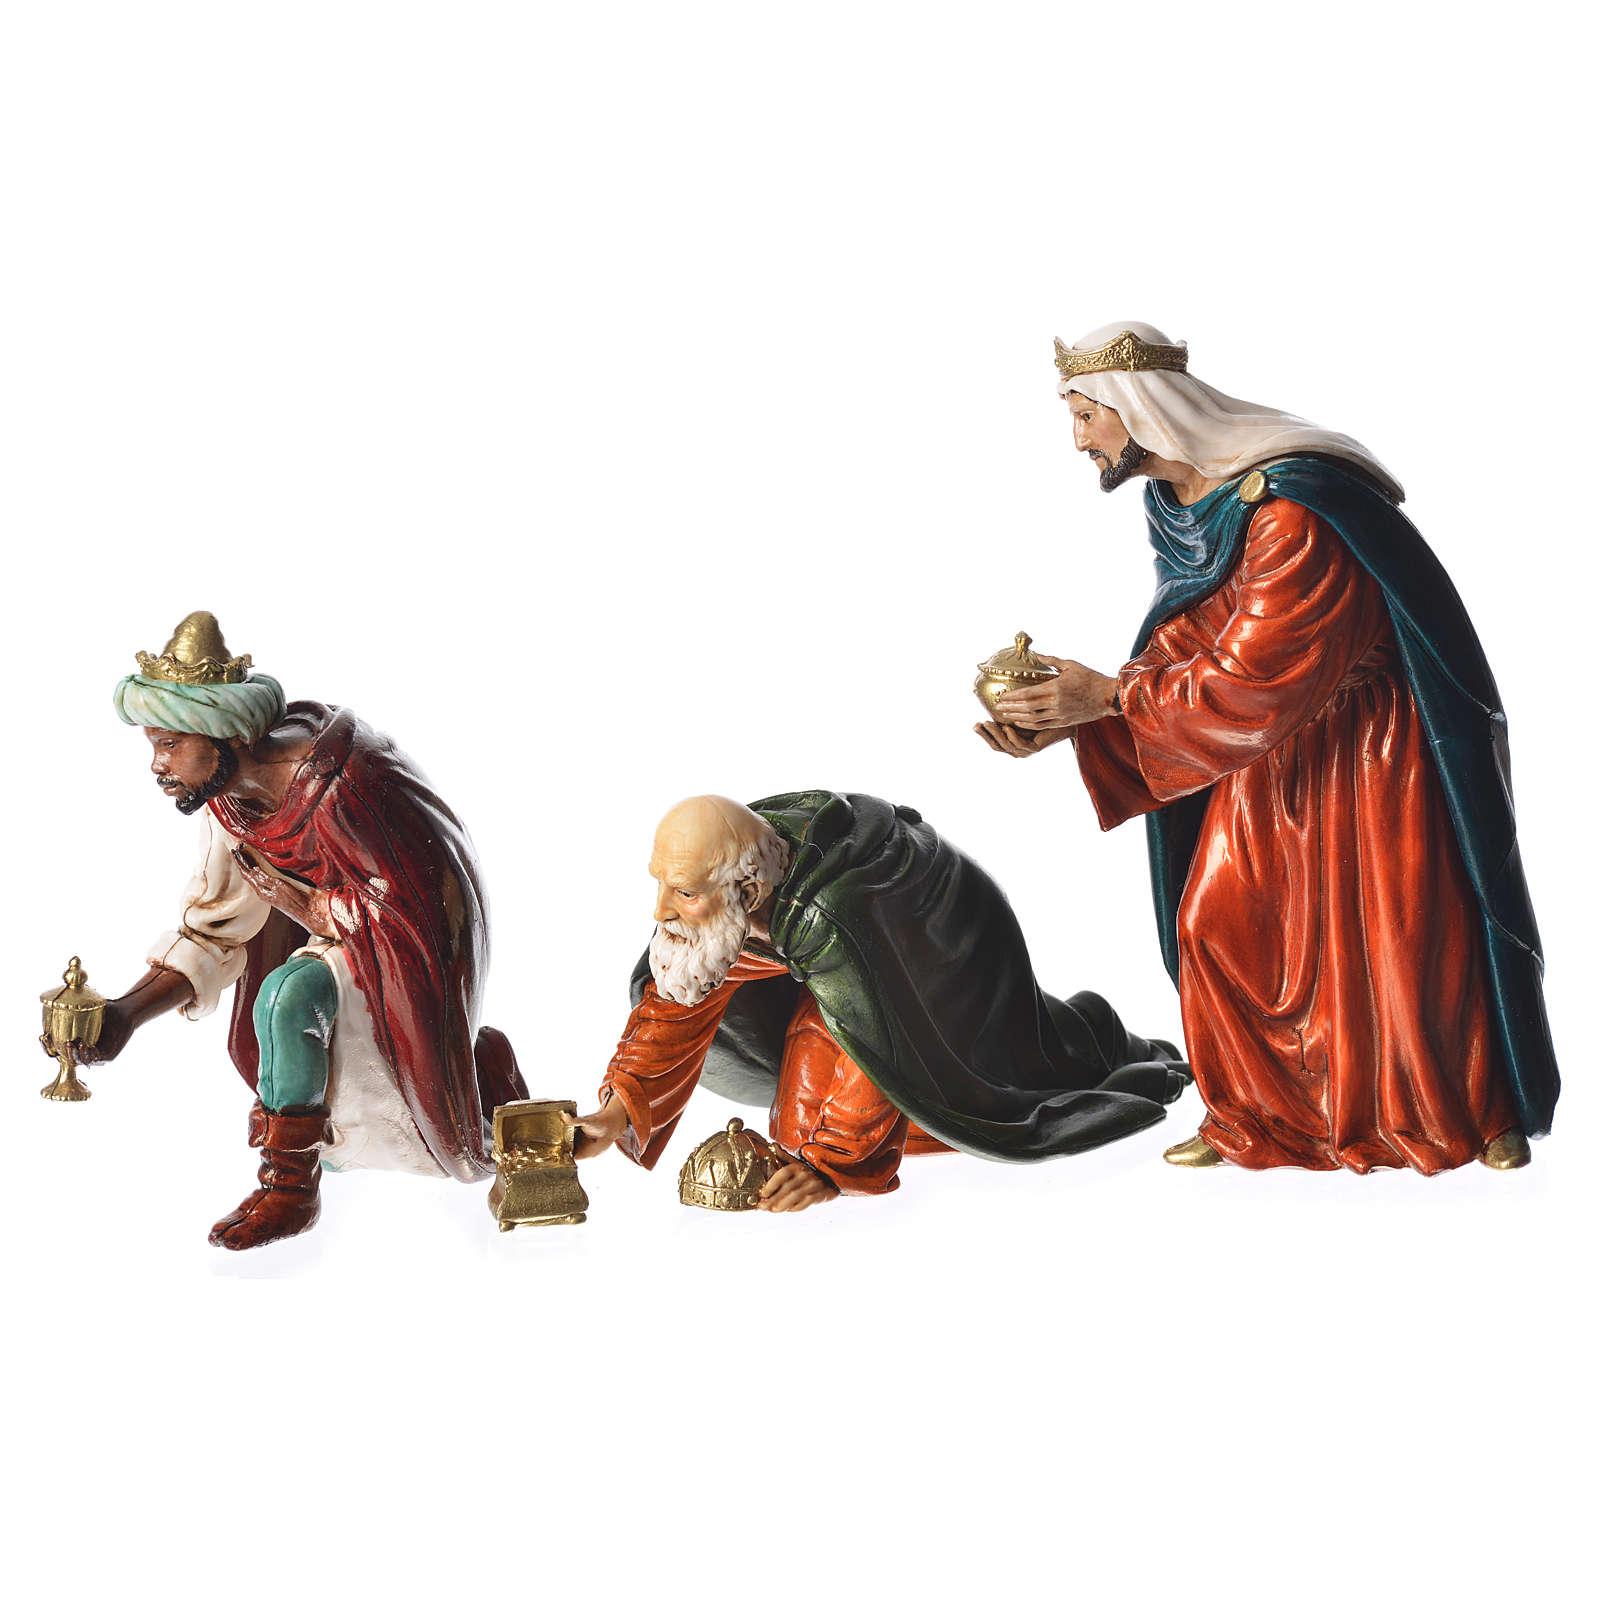 Wise men, nativity figurines, 13cm Moranduzzo 4